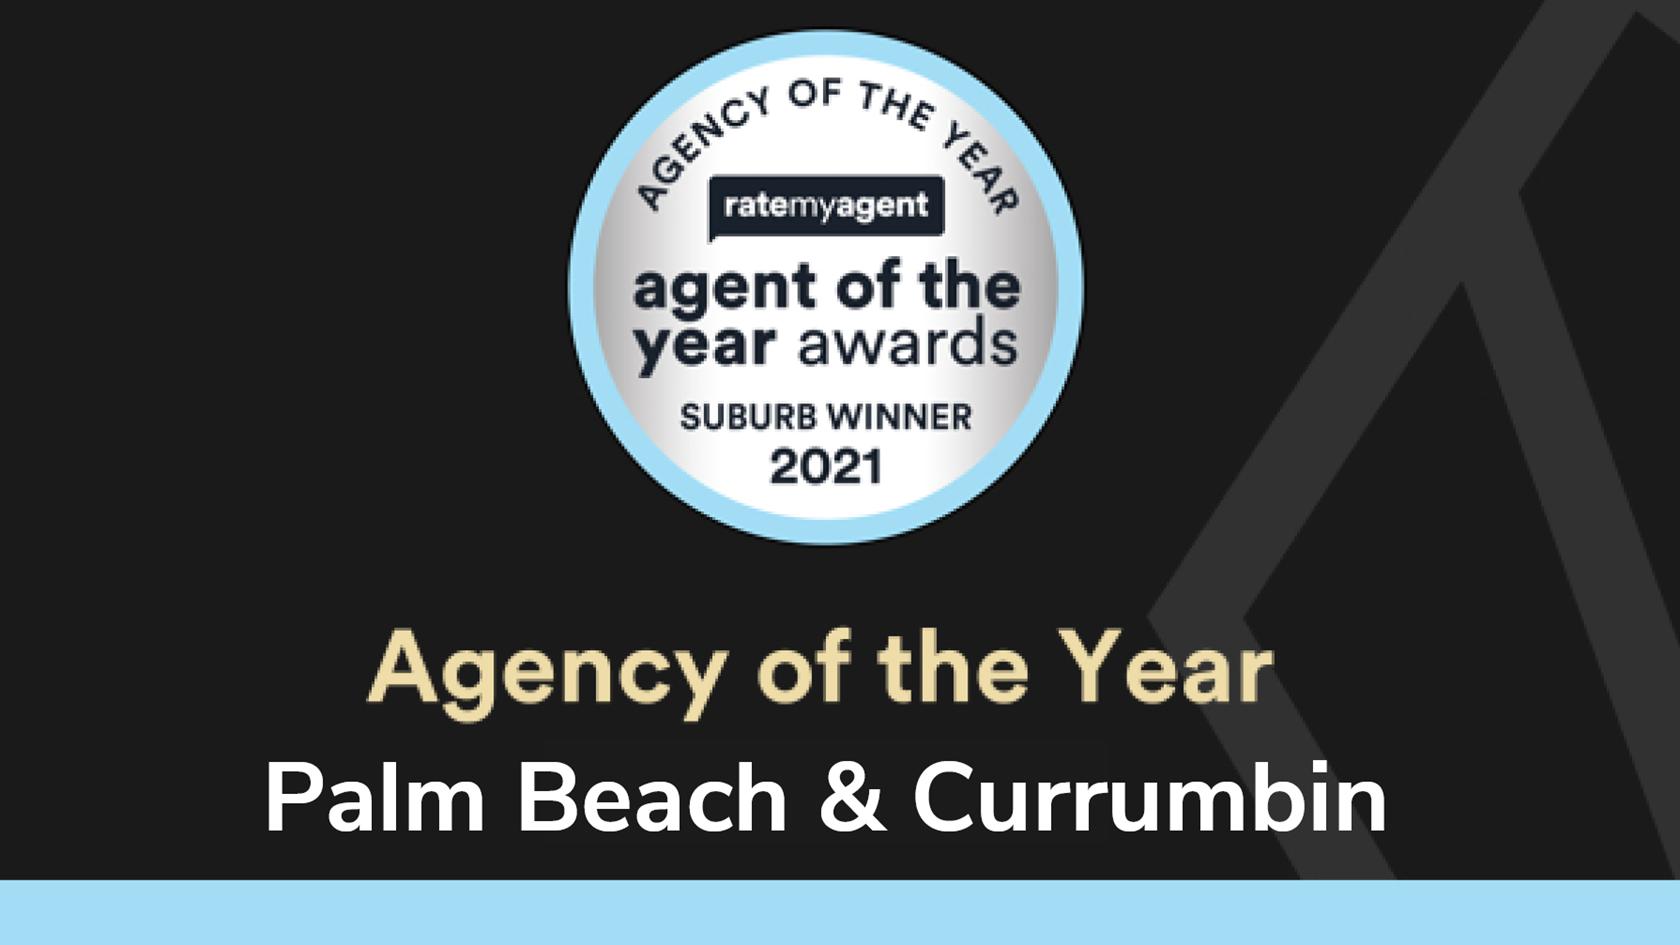 LJ Hooker Palm Beach Wins Agency of the Year Award